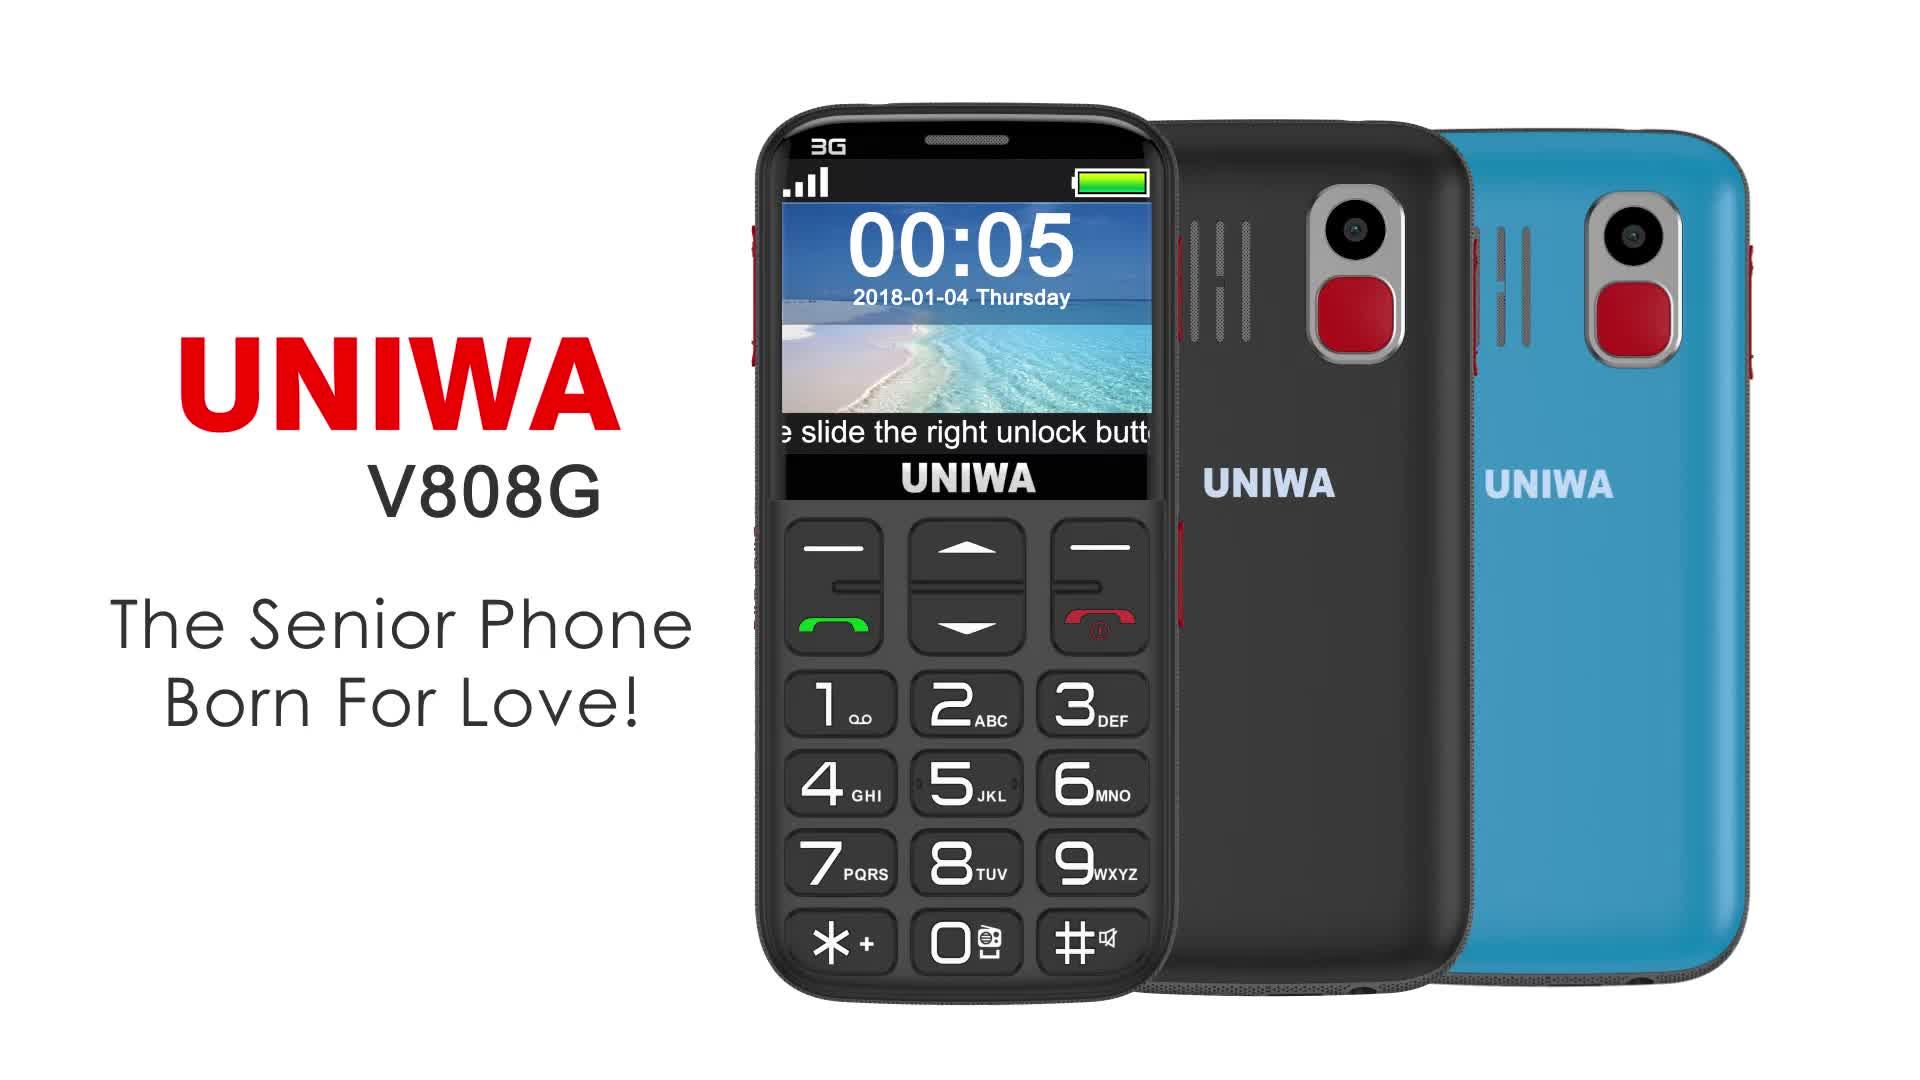 UNIWA V808G 2.31 big button China Cheap 3g For Old Age